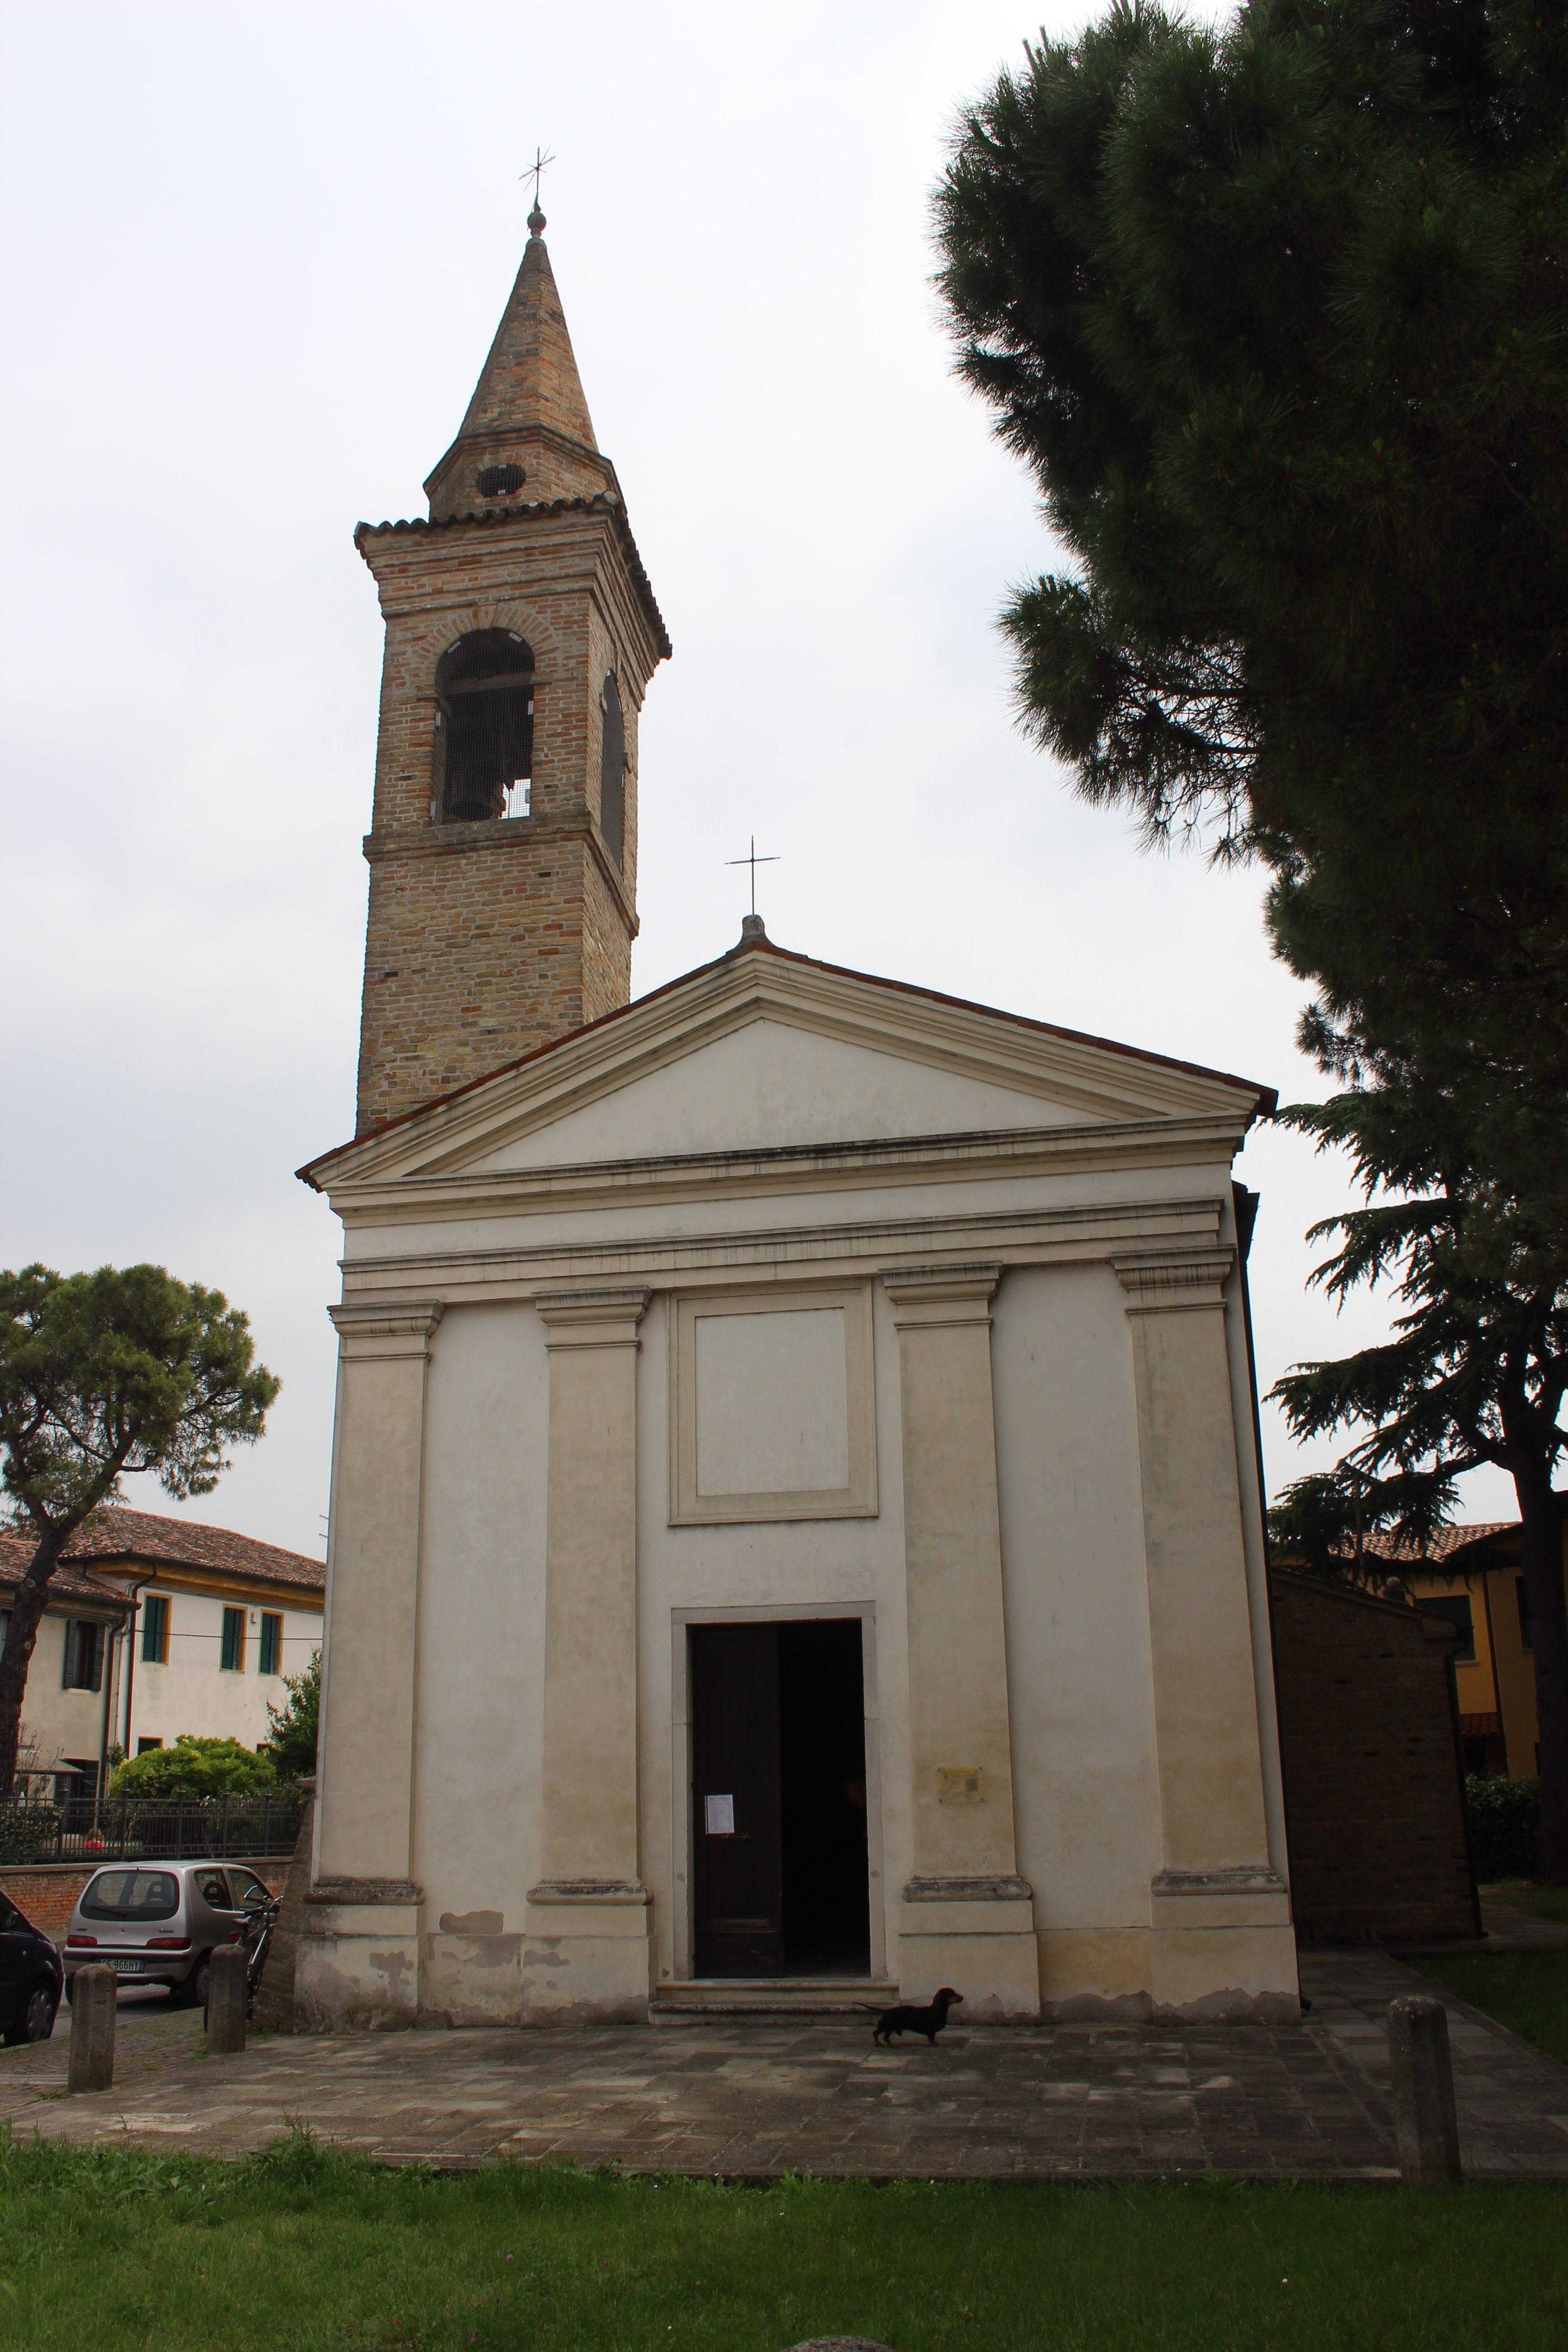 Chiesa di San Nicolò a Piove di Sacco